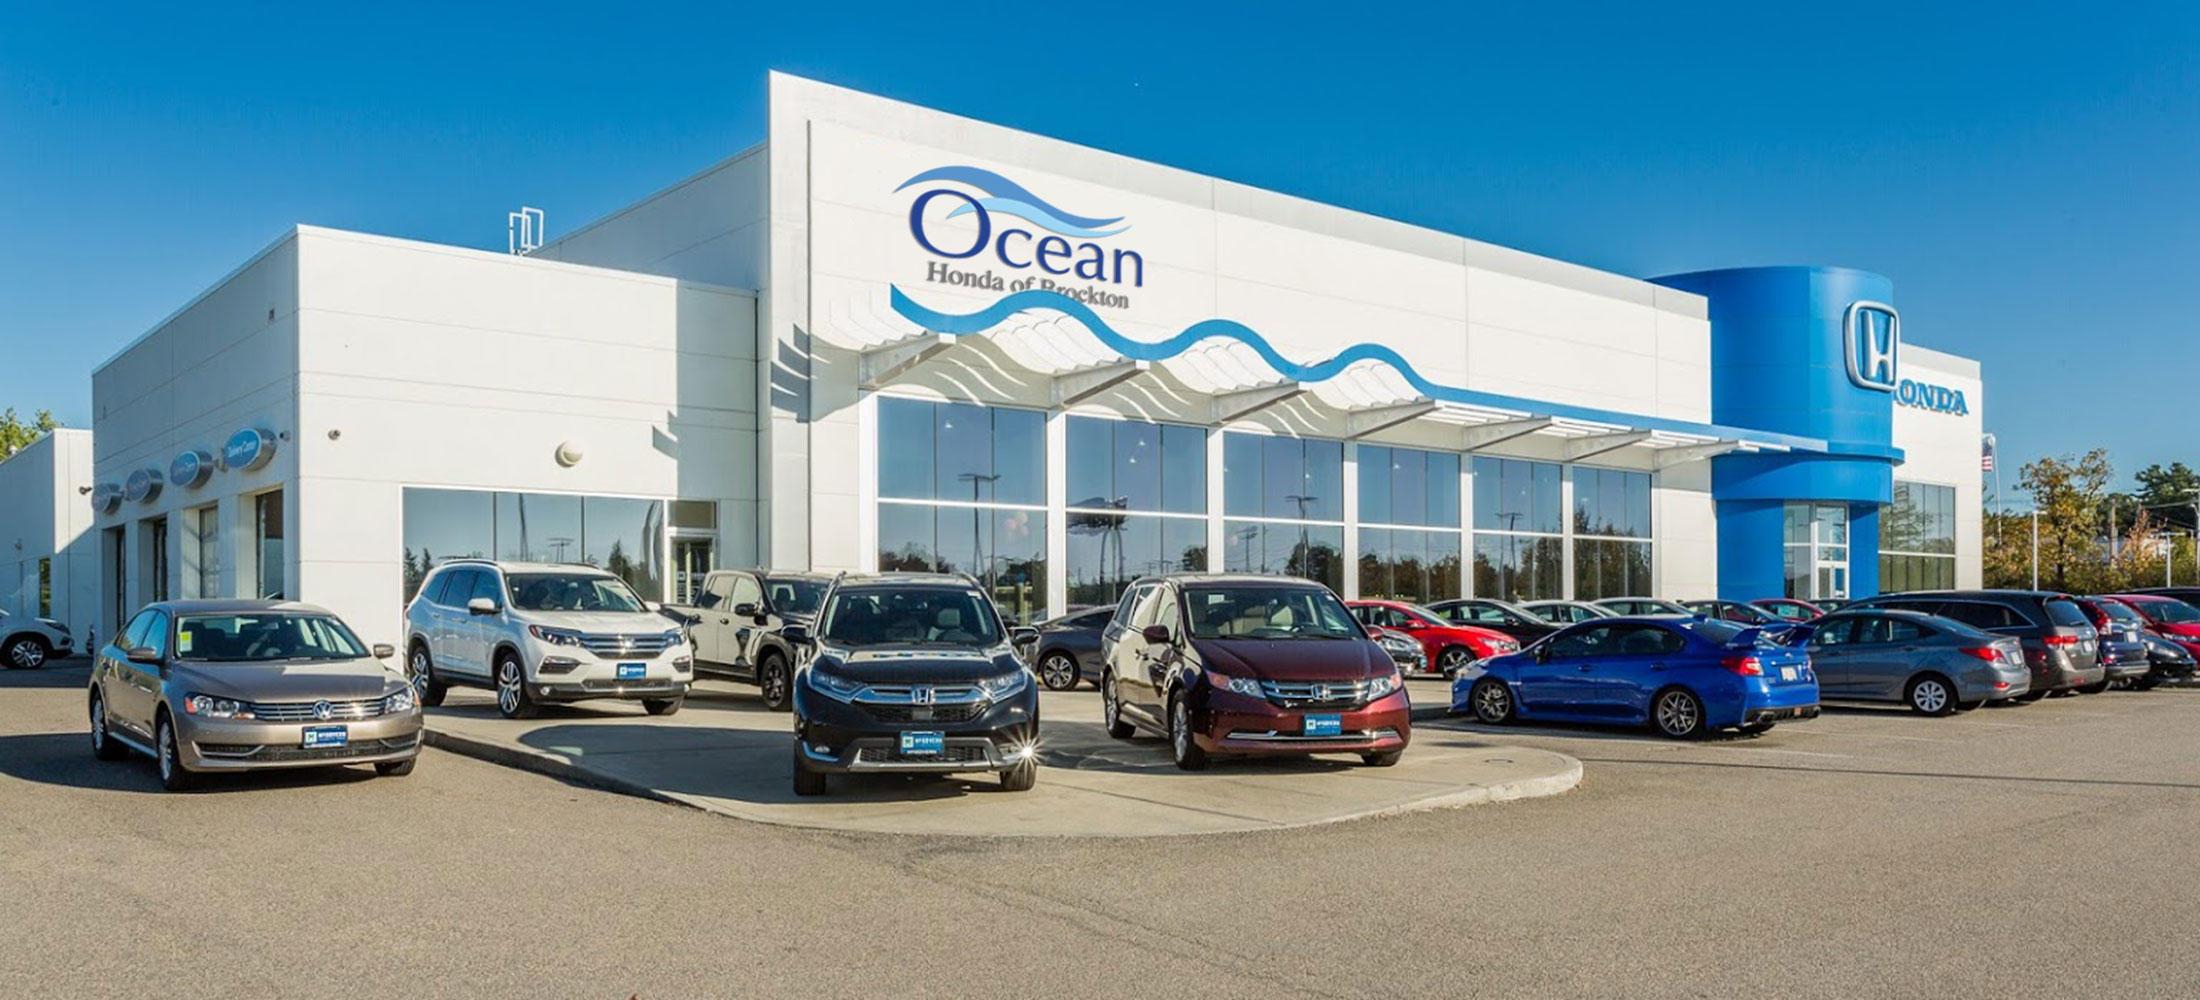 Ocean Honda of Brockton image 0